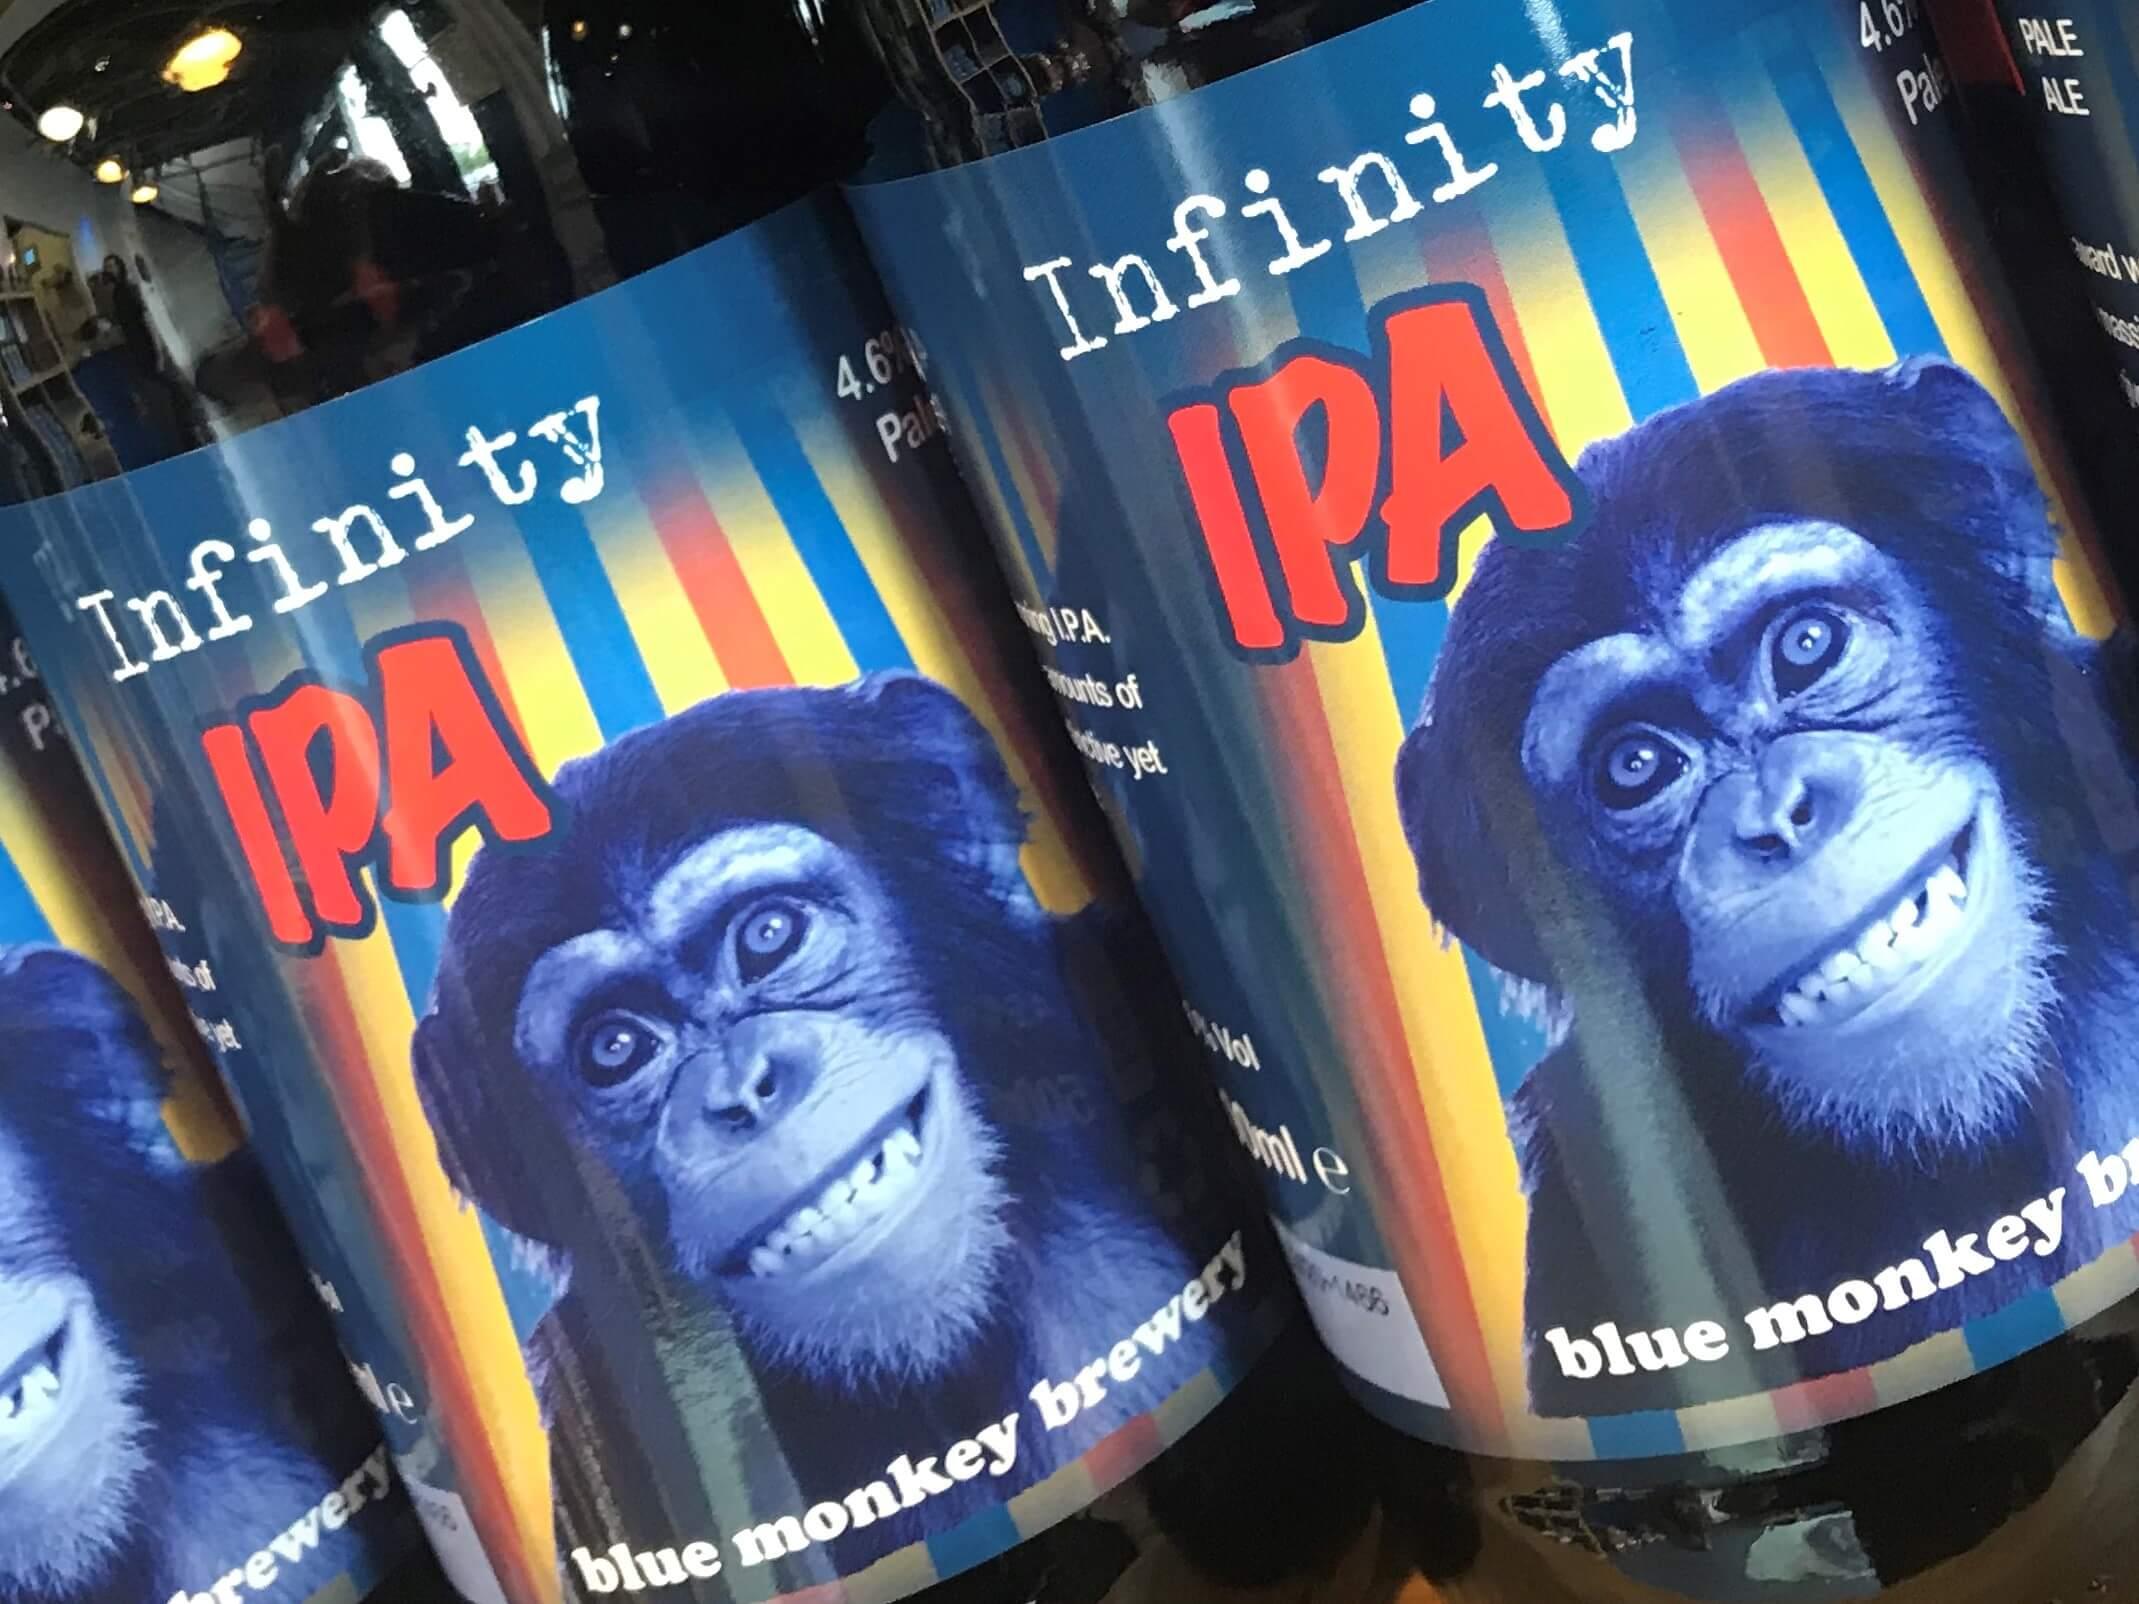 Blue Monkey Brewery